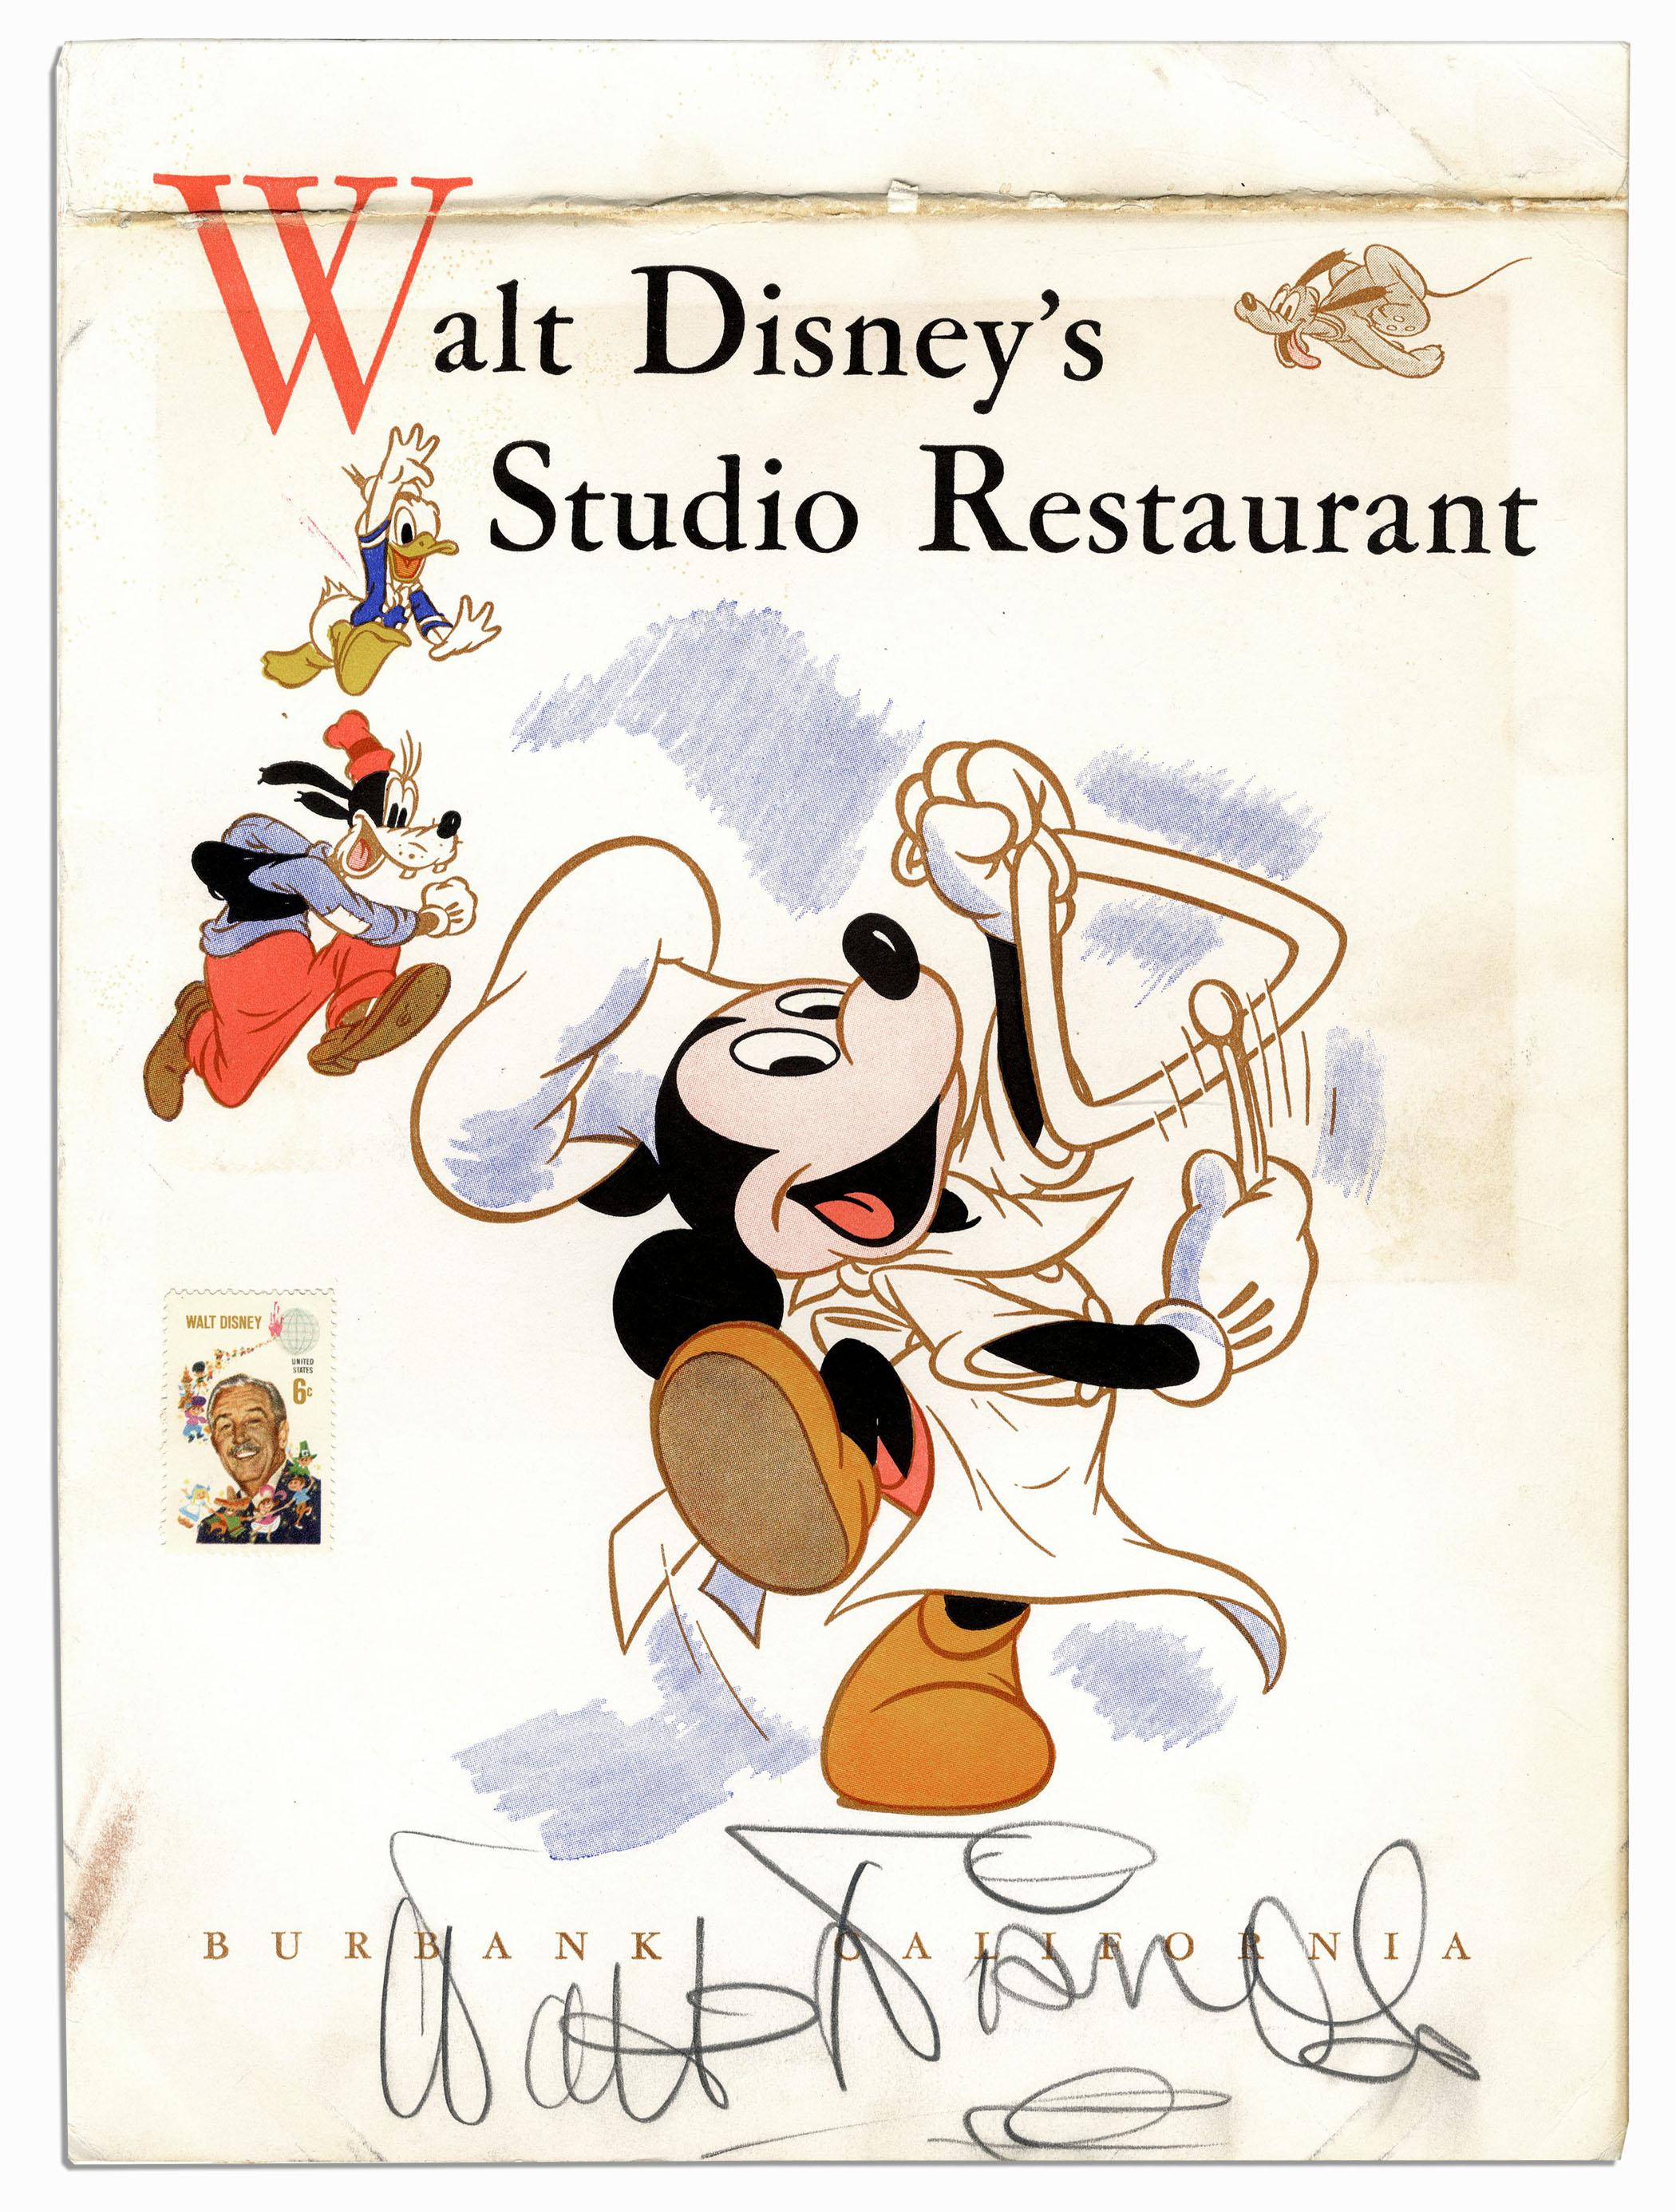 Walt Disney Autograph Walt Disney Signed Menu From the Disney Studio Restaurant -- With Phil Sears COA